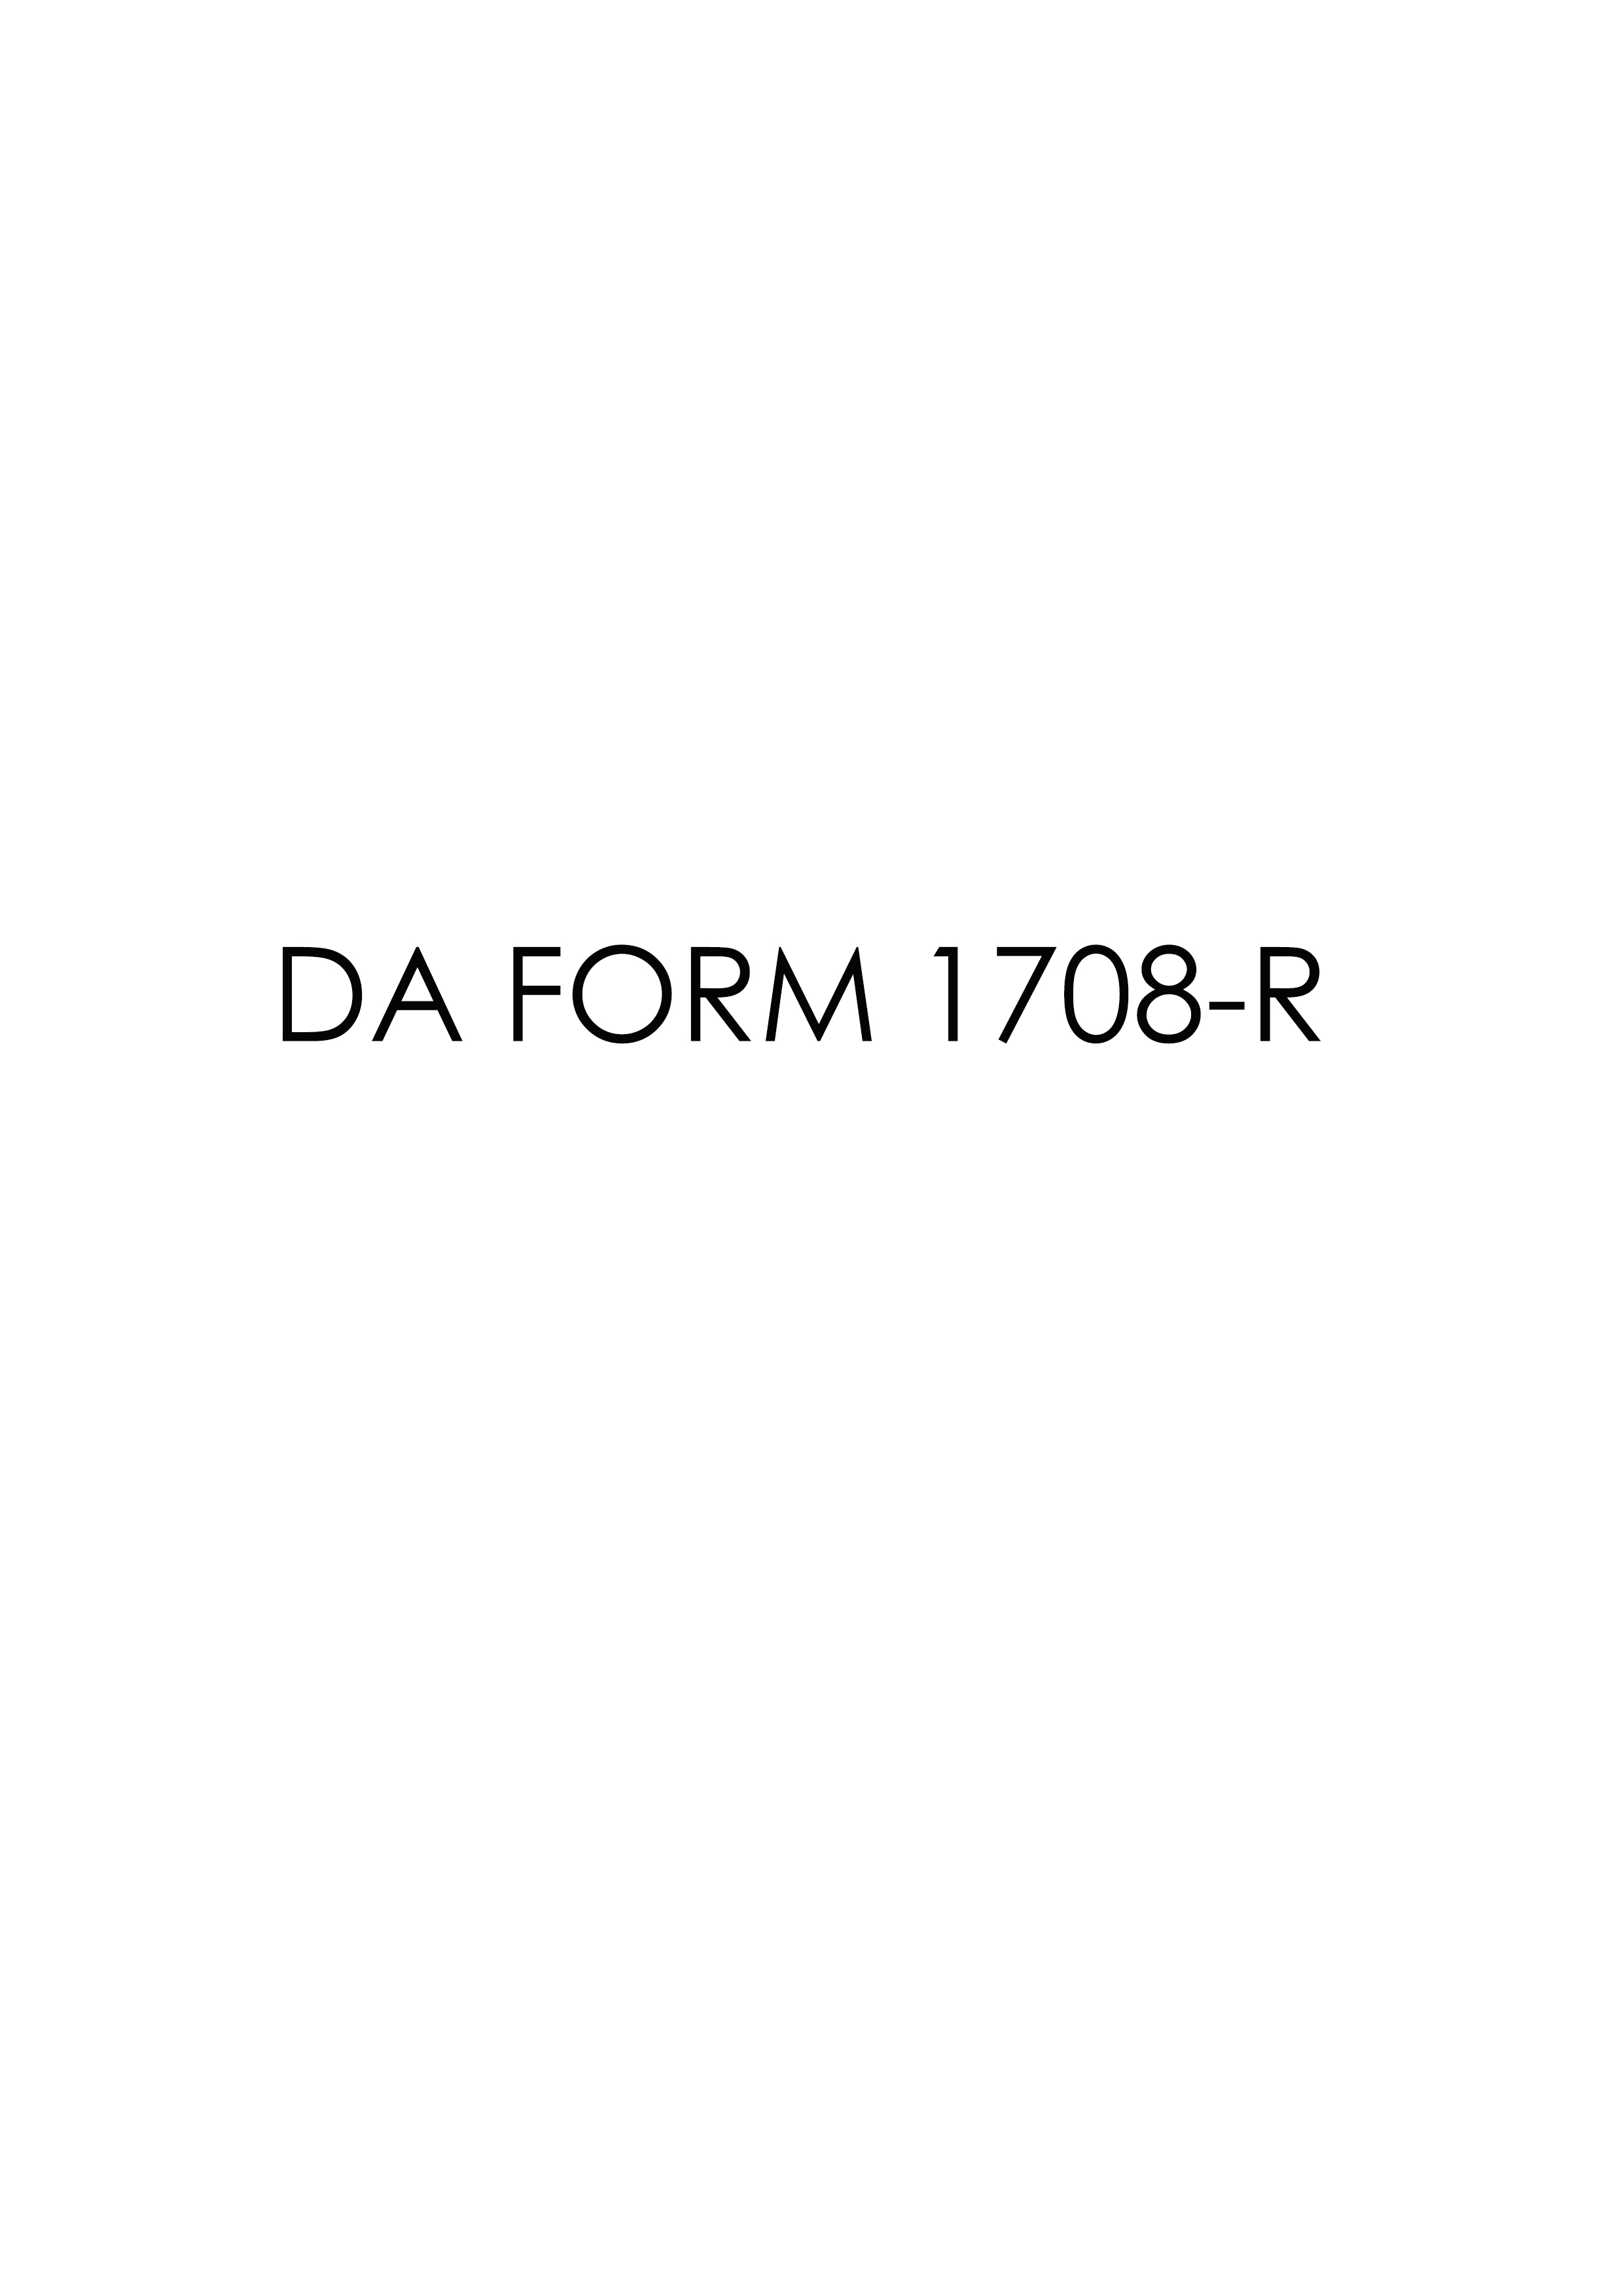 Download Fillable da Form 1708-R